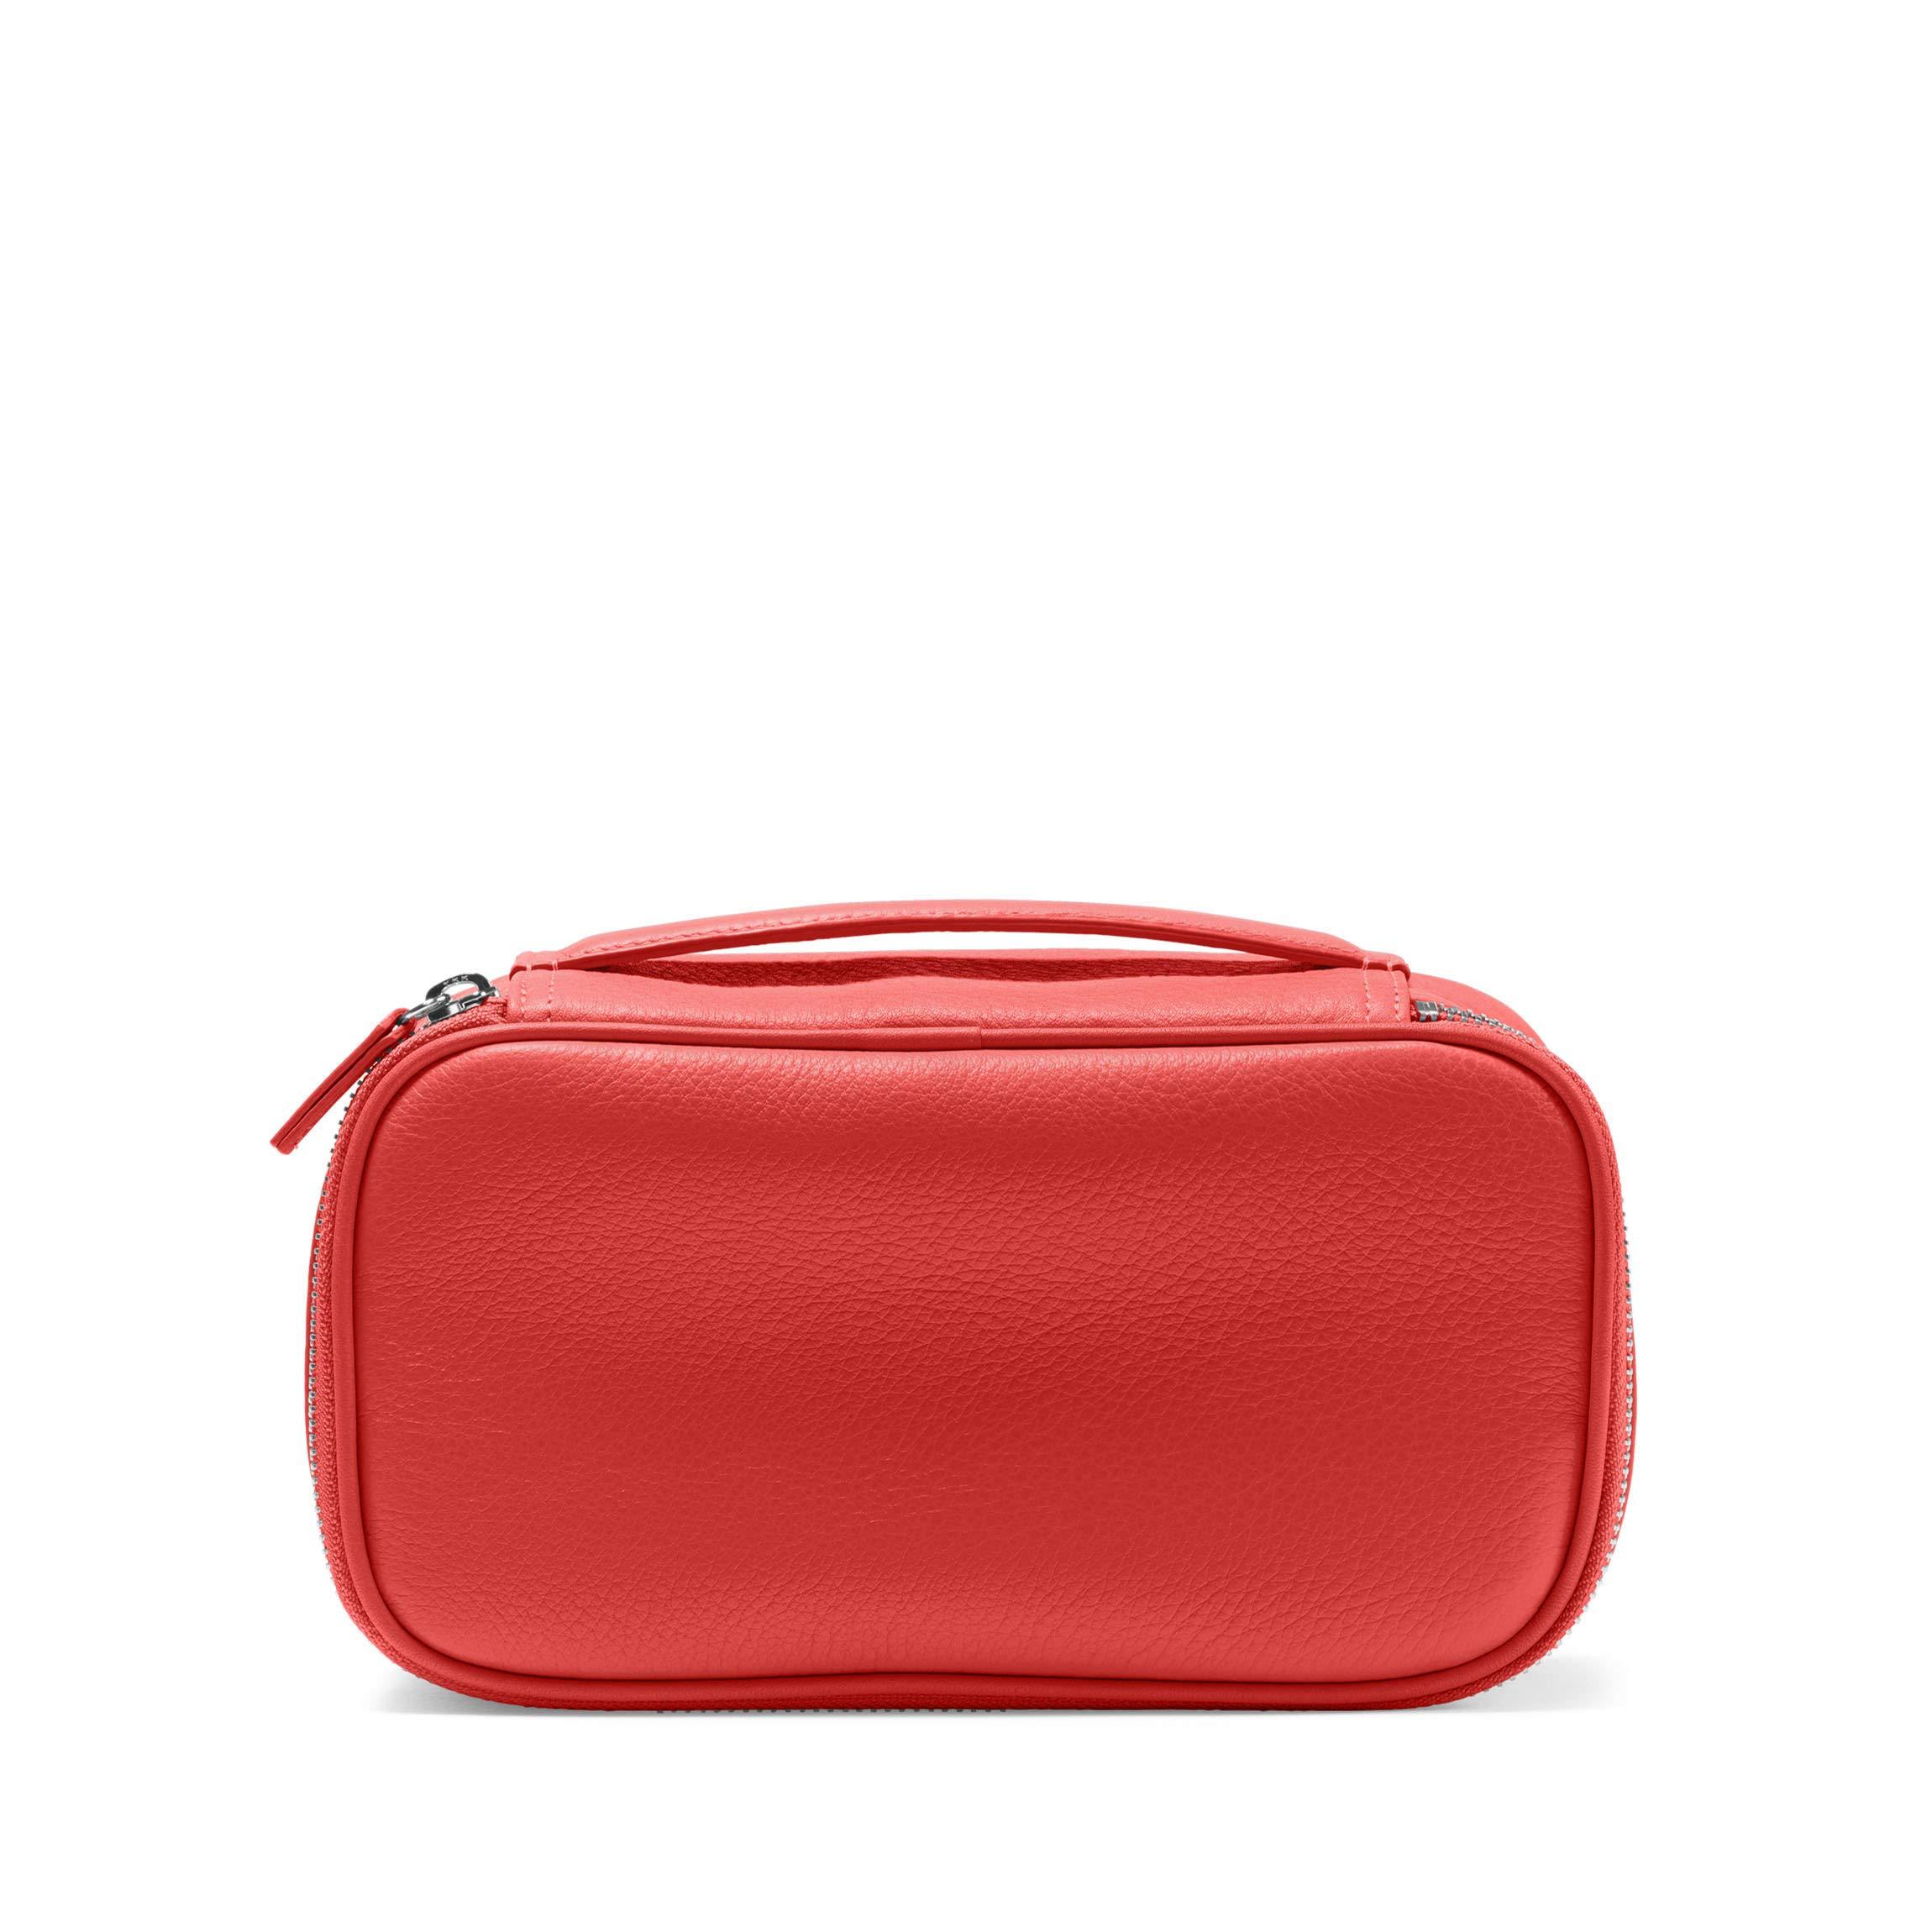 Leatherology Medium Travel Organizer - Full Grain Leather Leather - Scarlet (red)